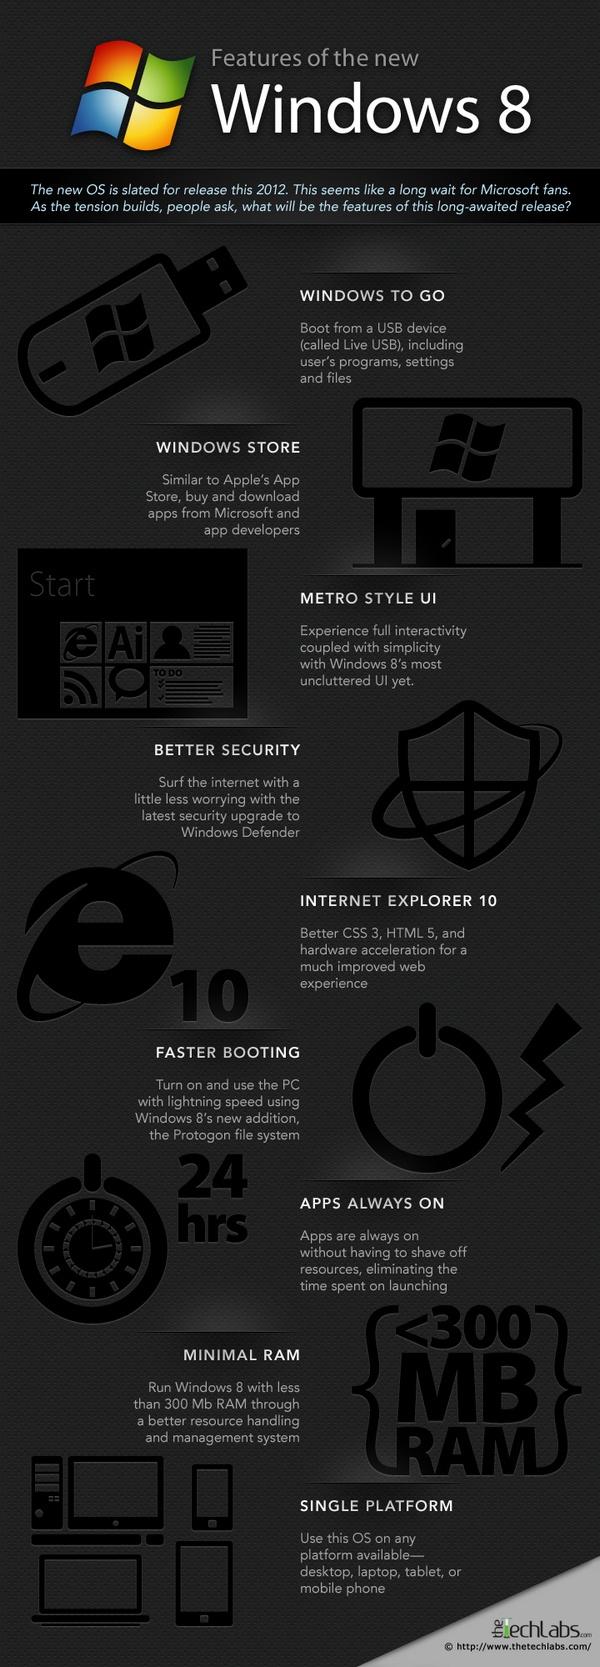 Poster design software windows 8 - Windows 8 Infographic Brandless Blog